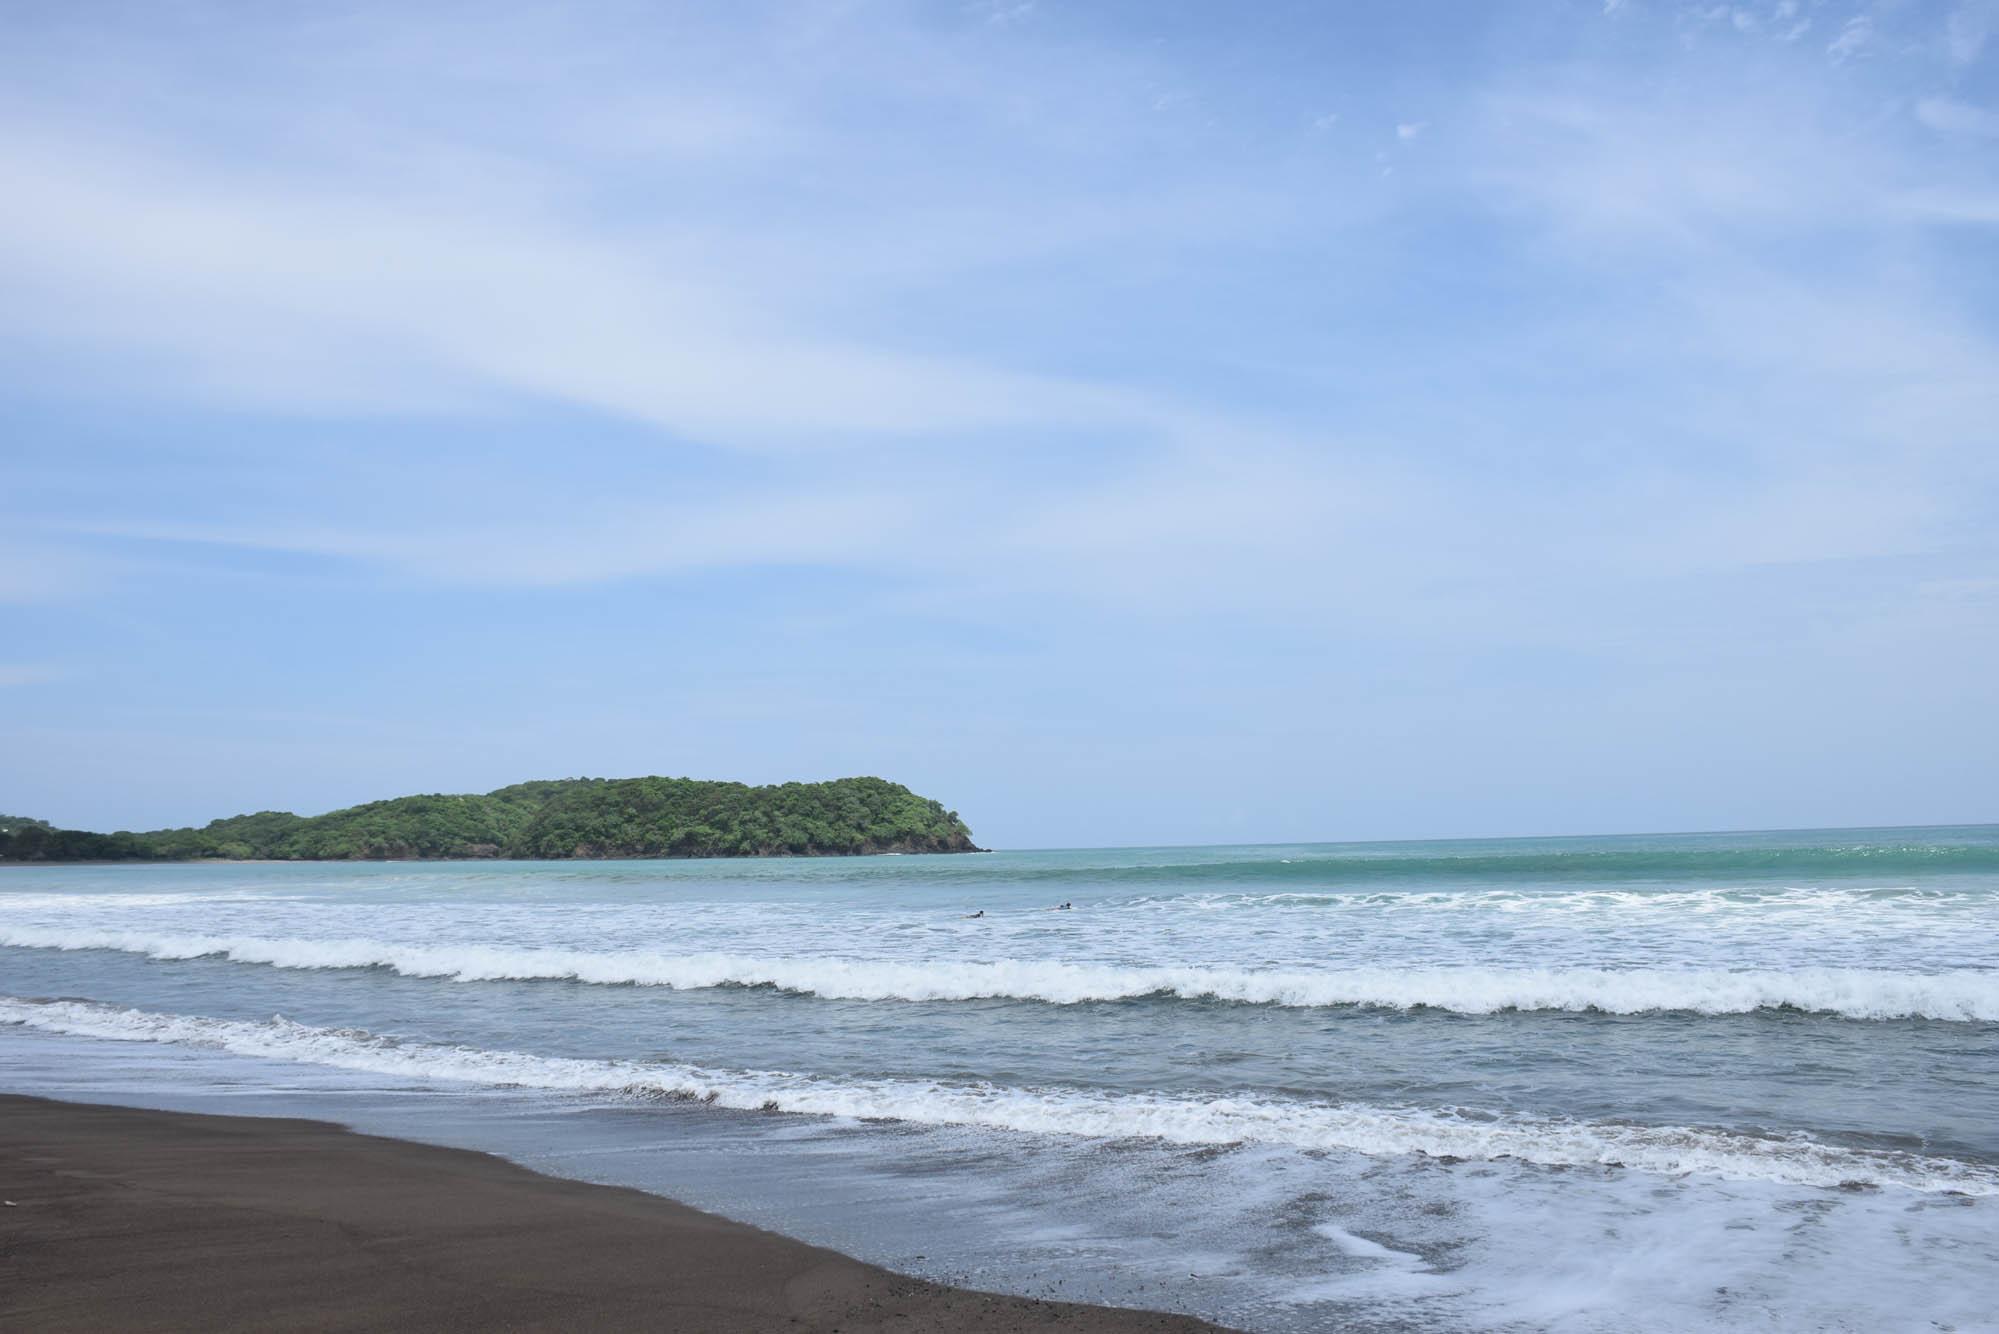 Pedasi-Isla-Iguana-Panama-Andromeda-Playa-Venao-LalaRebelo_0442